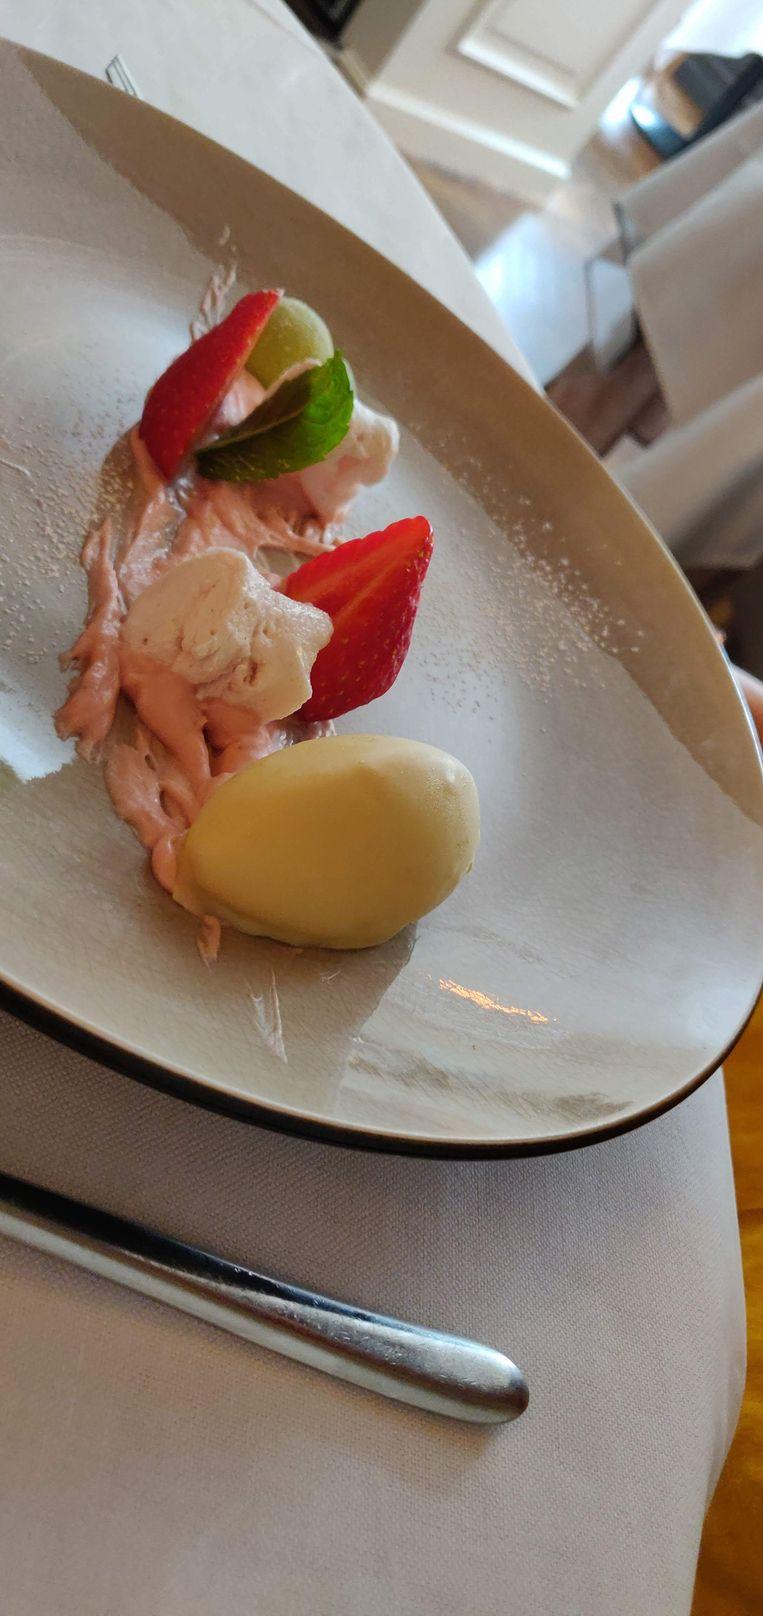 Zondagsmenu De Marmiet: het dessert